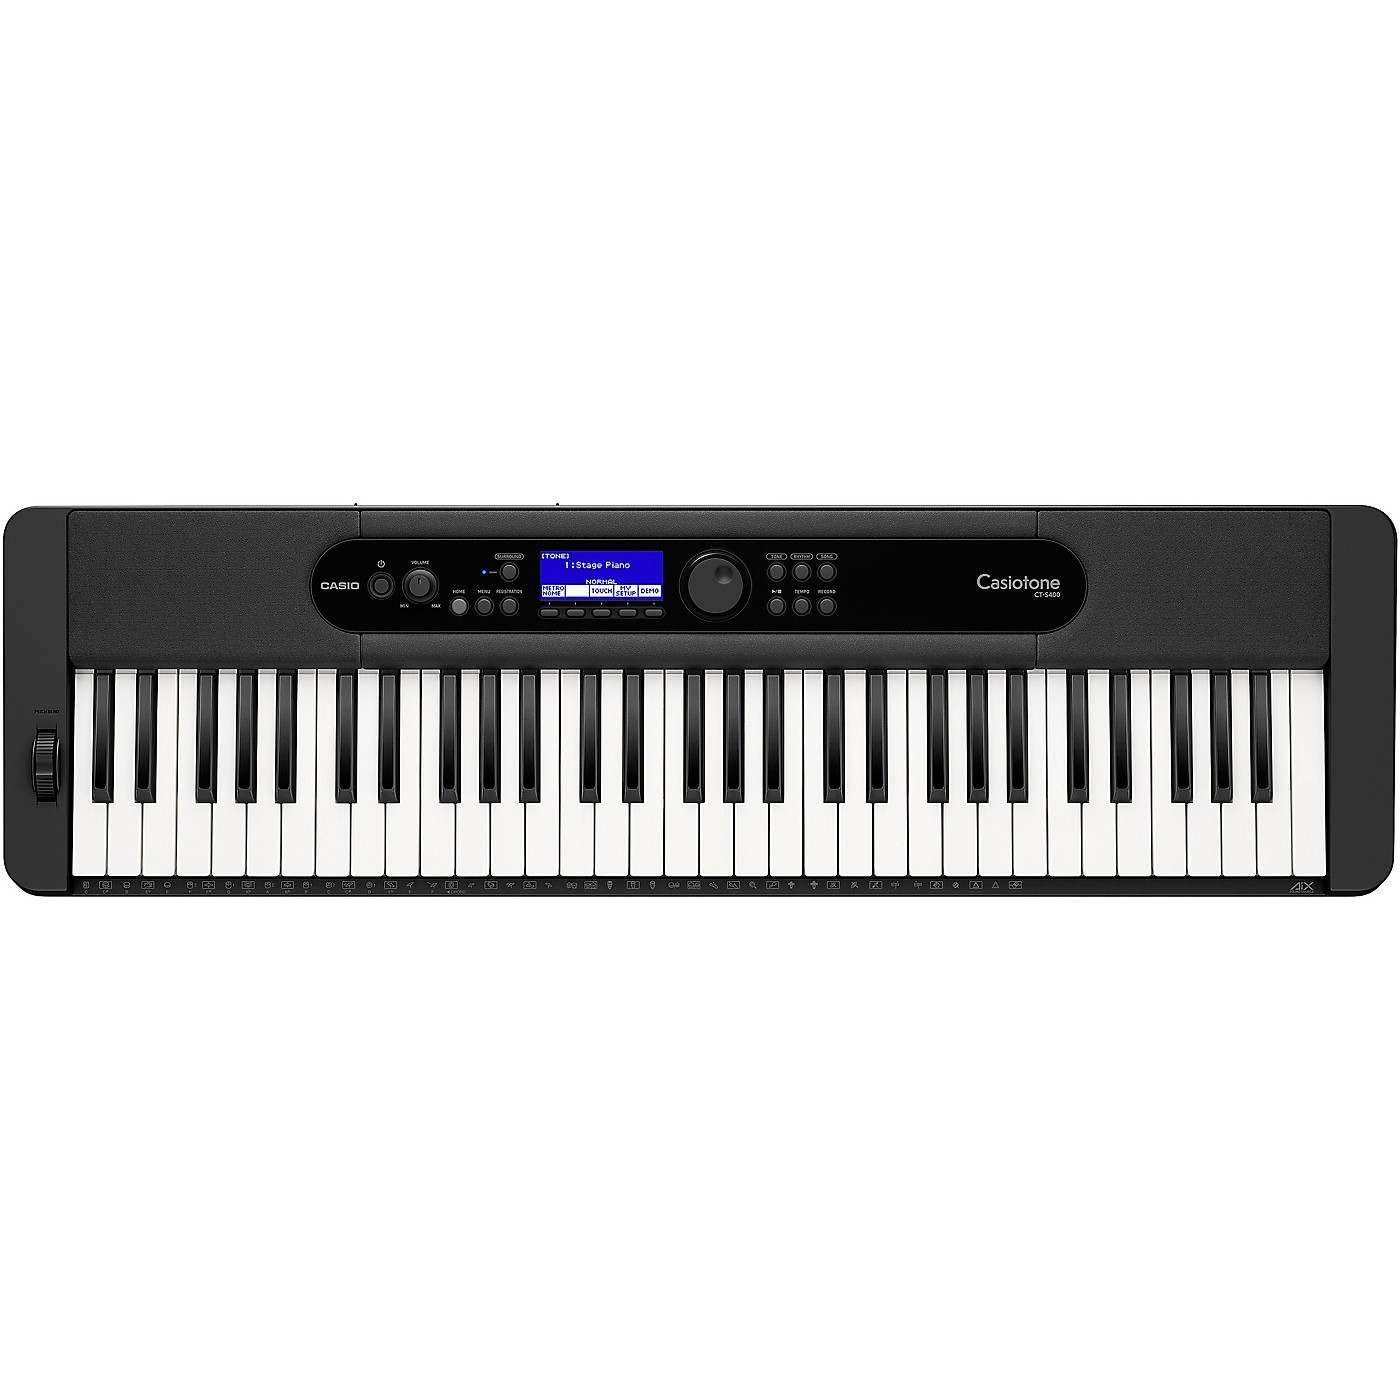 Casio Casiotone CT-S400 61-Key Portable Keyboard thumbnail